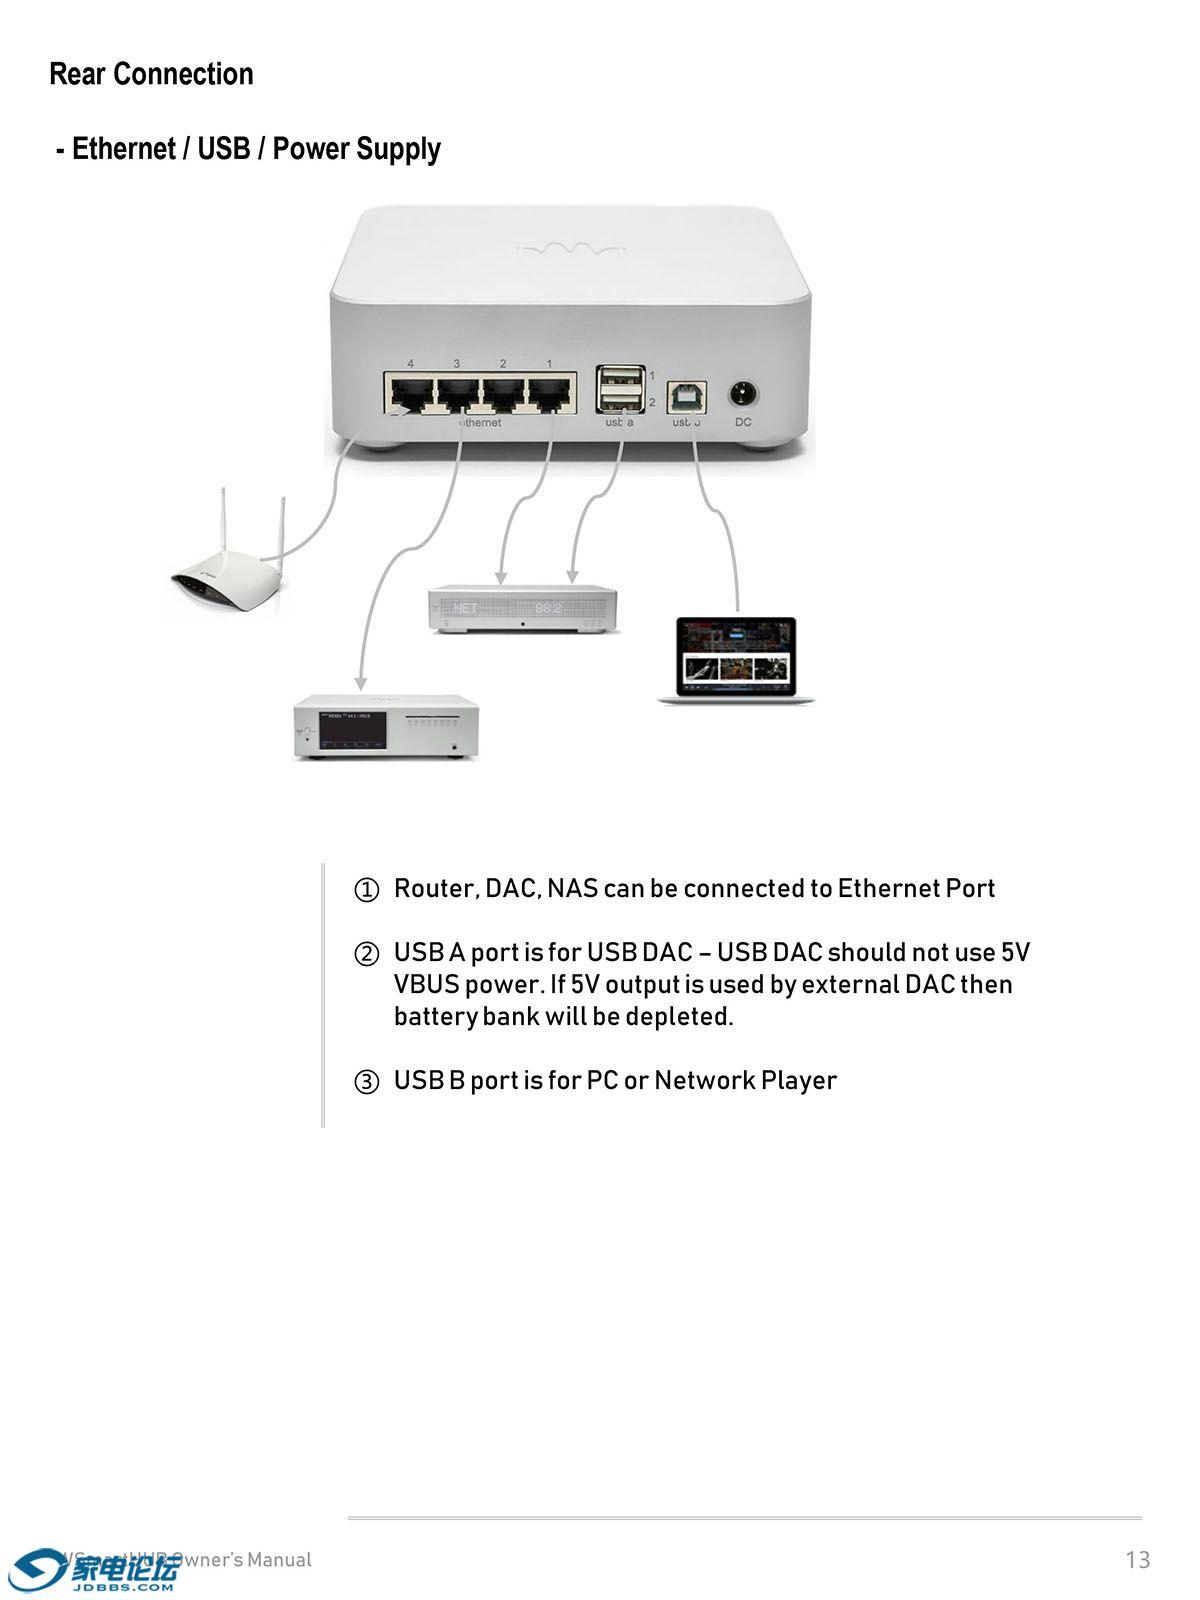 WSmartHub Owners Manual Ver 4.jpg